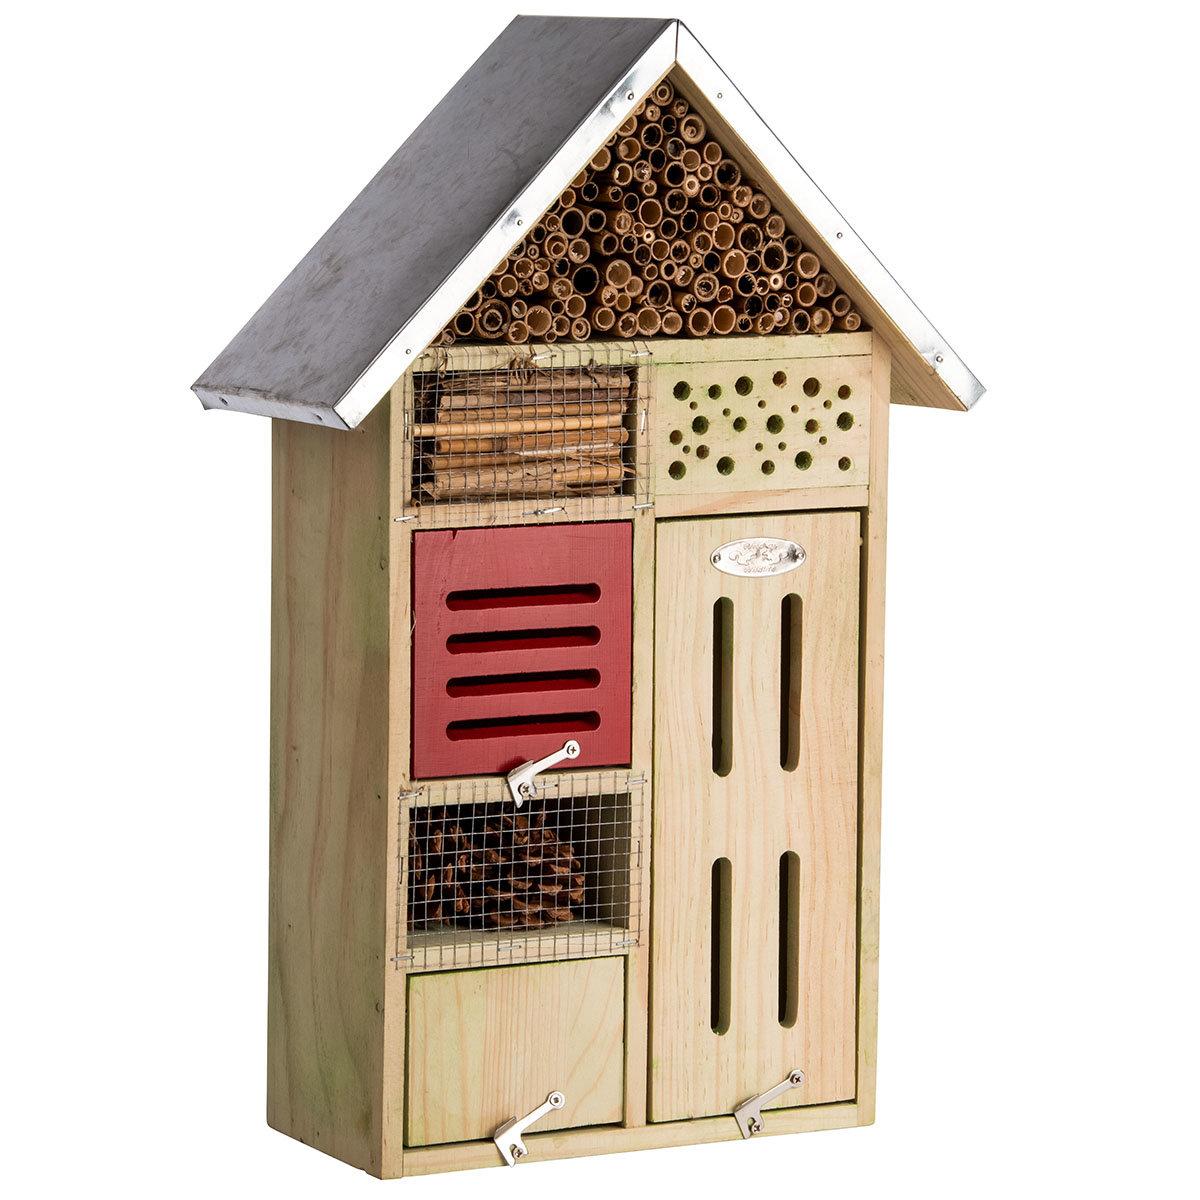 Insektenhotel Nature mit Zinkdach, ca. 48x 31 cm | #5